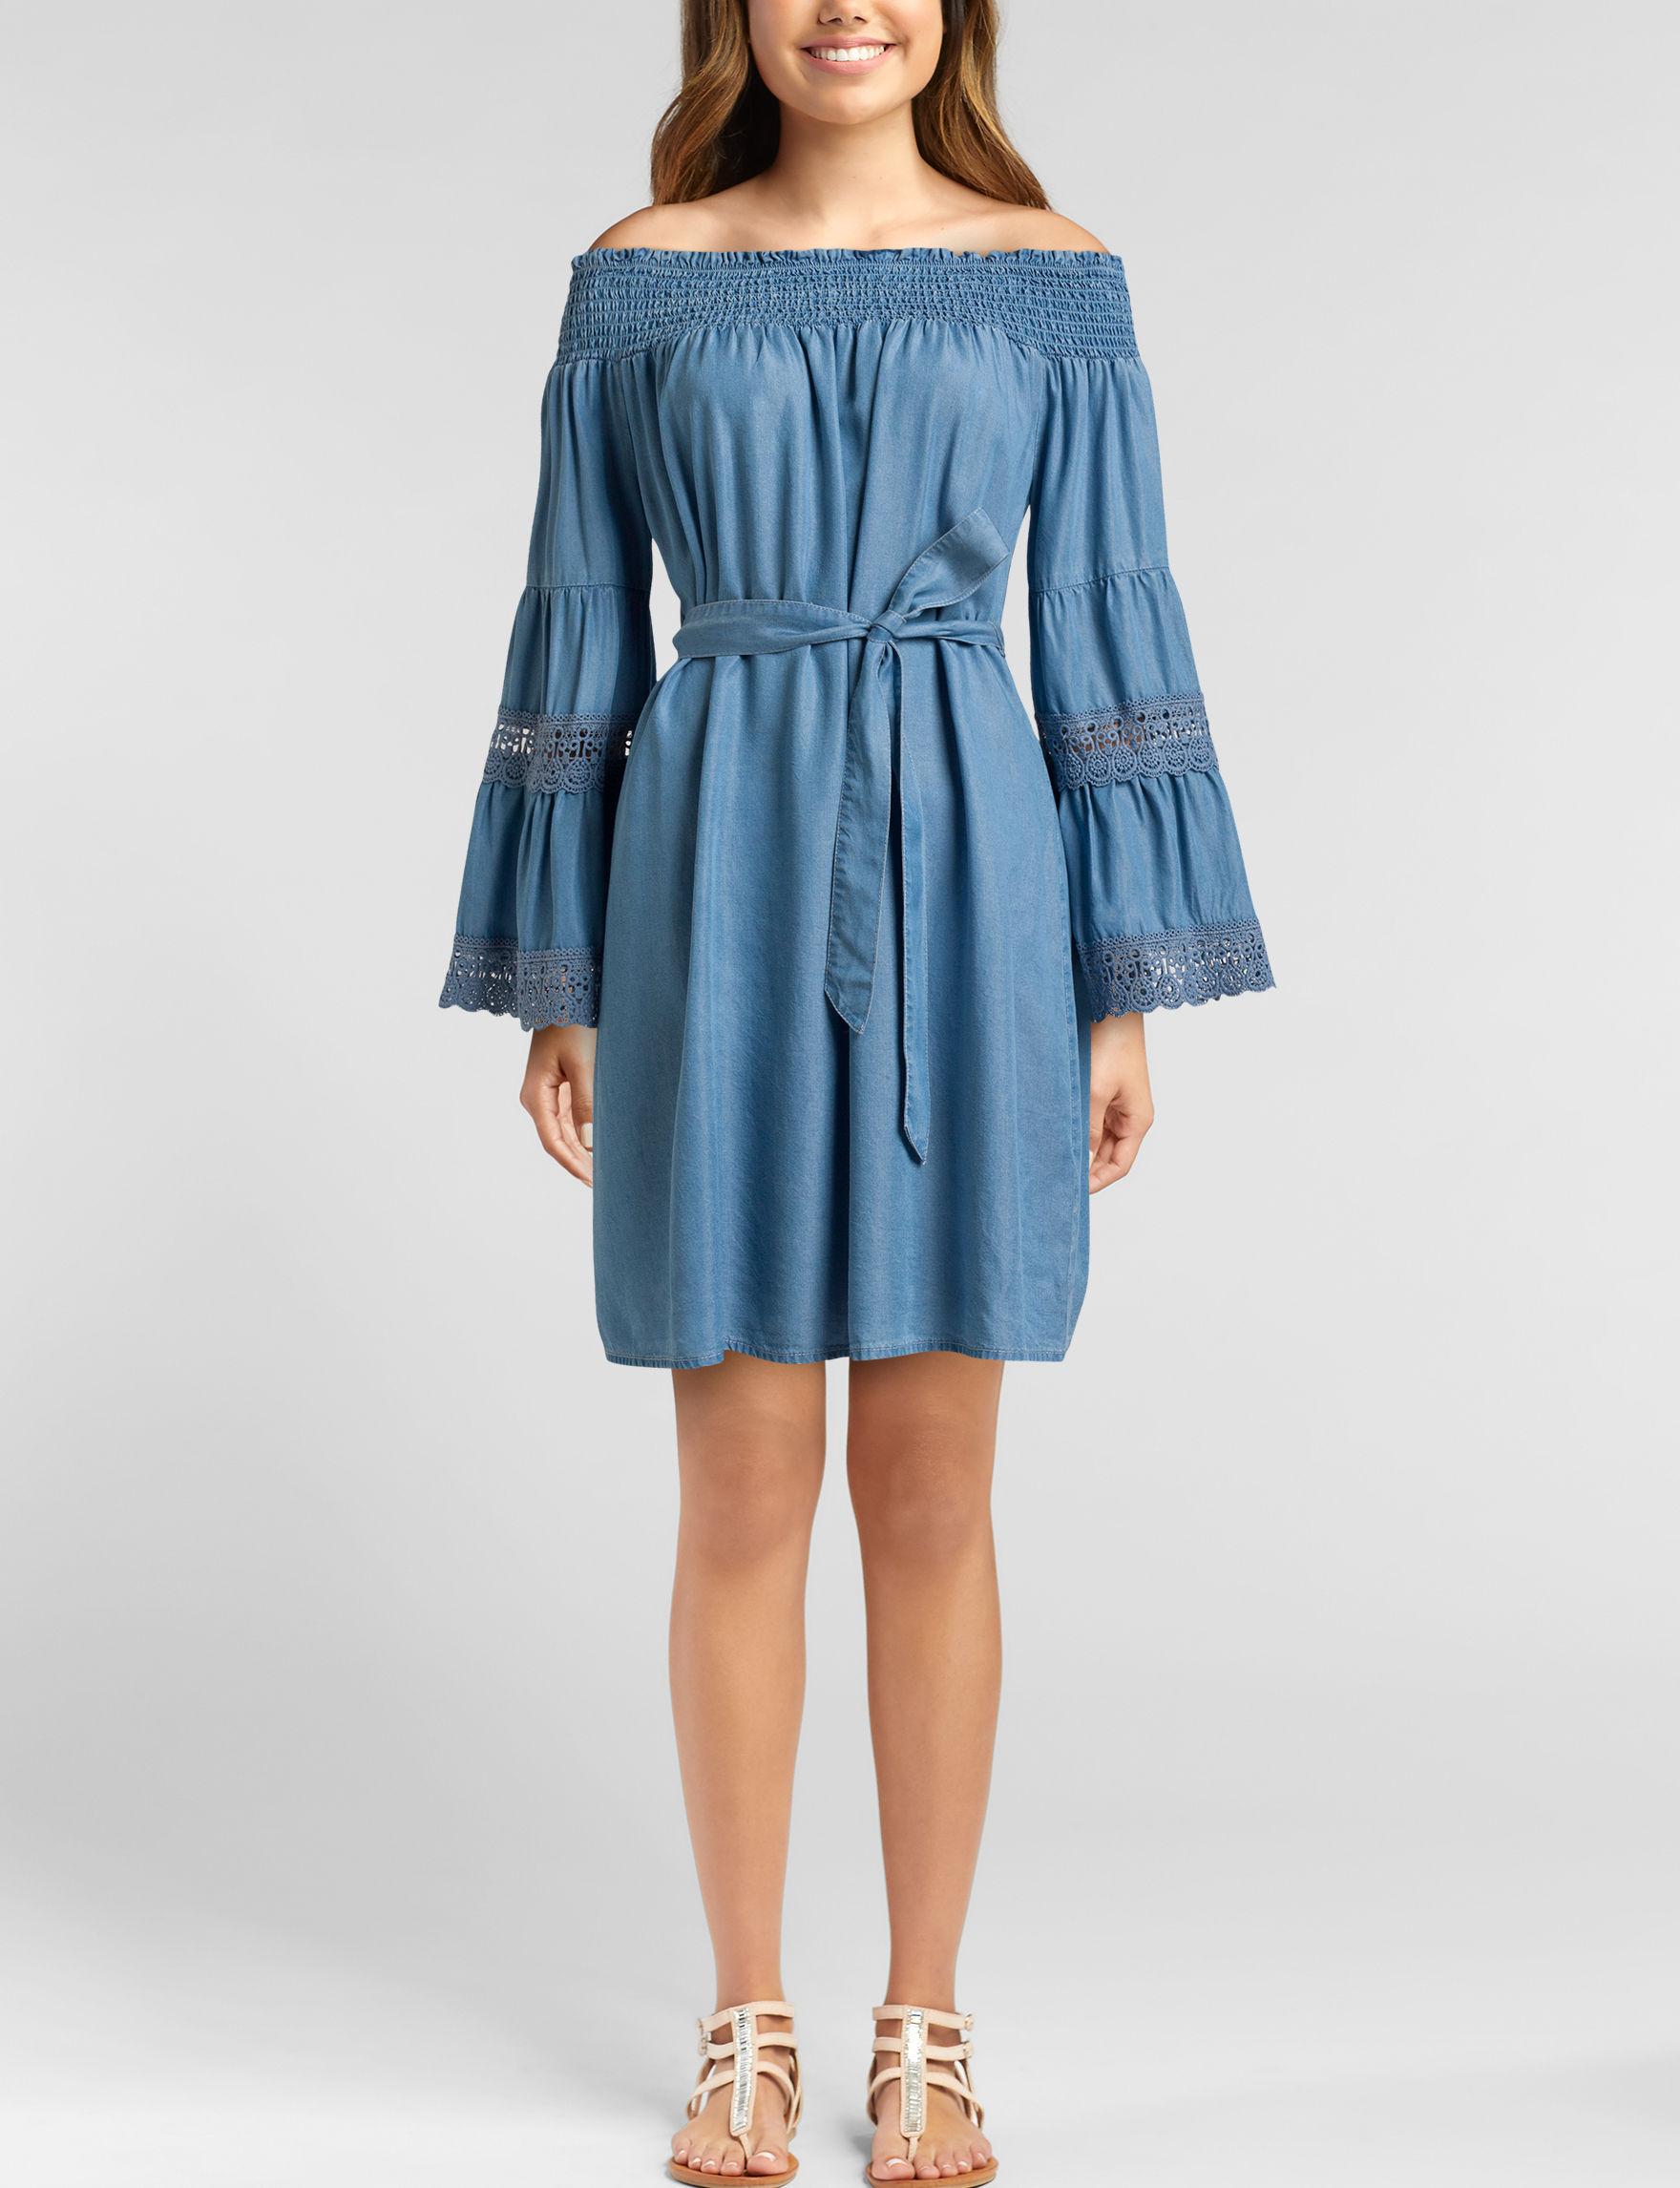 Signature Studio Blue Everyday & Casual Shift Dresses